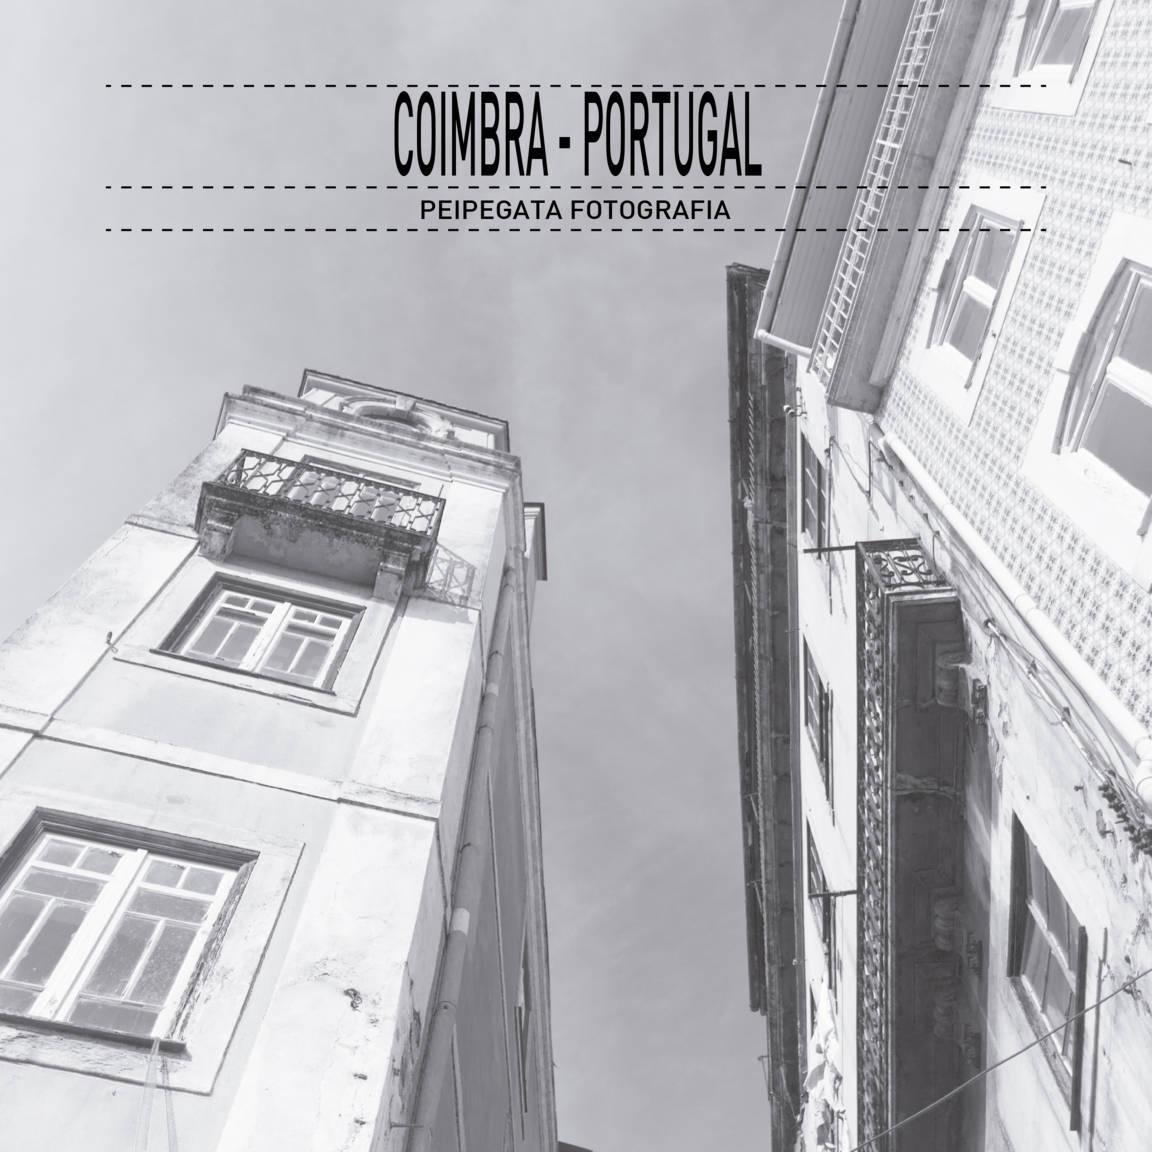 Portugal – Coimbra